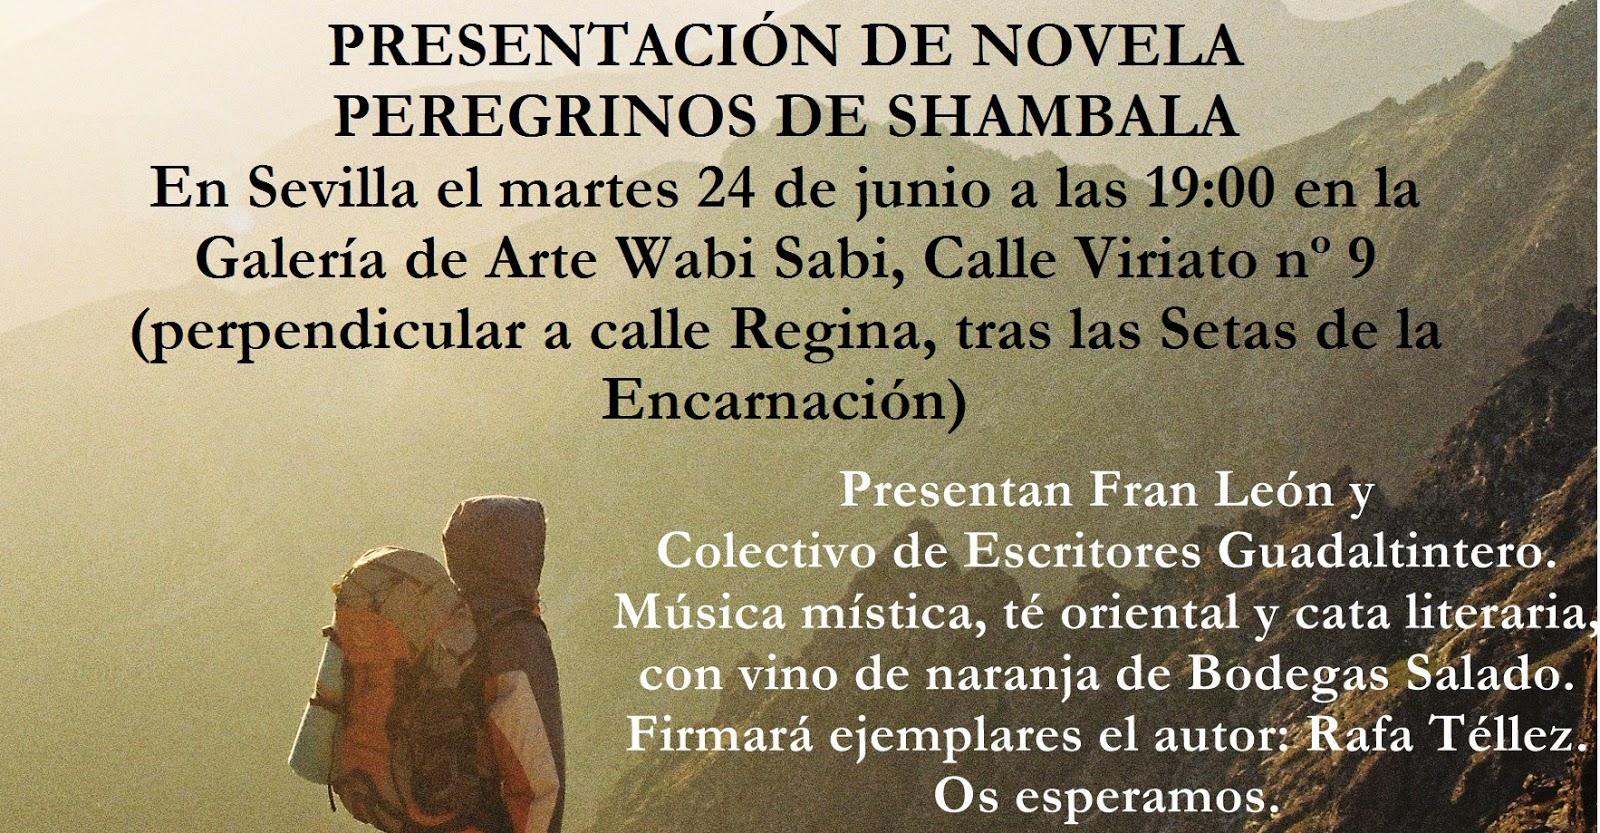 Peregrinos de Shambala ,novela de Rafael Téllez Romero